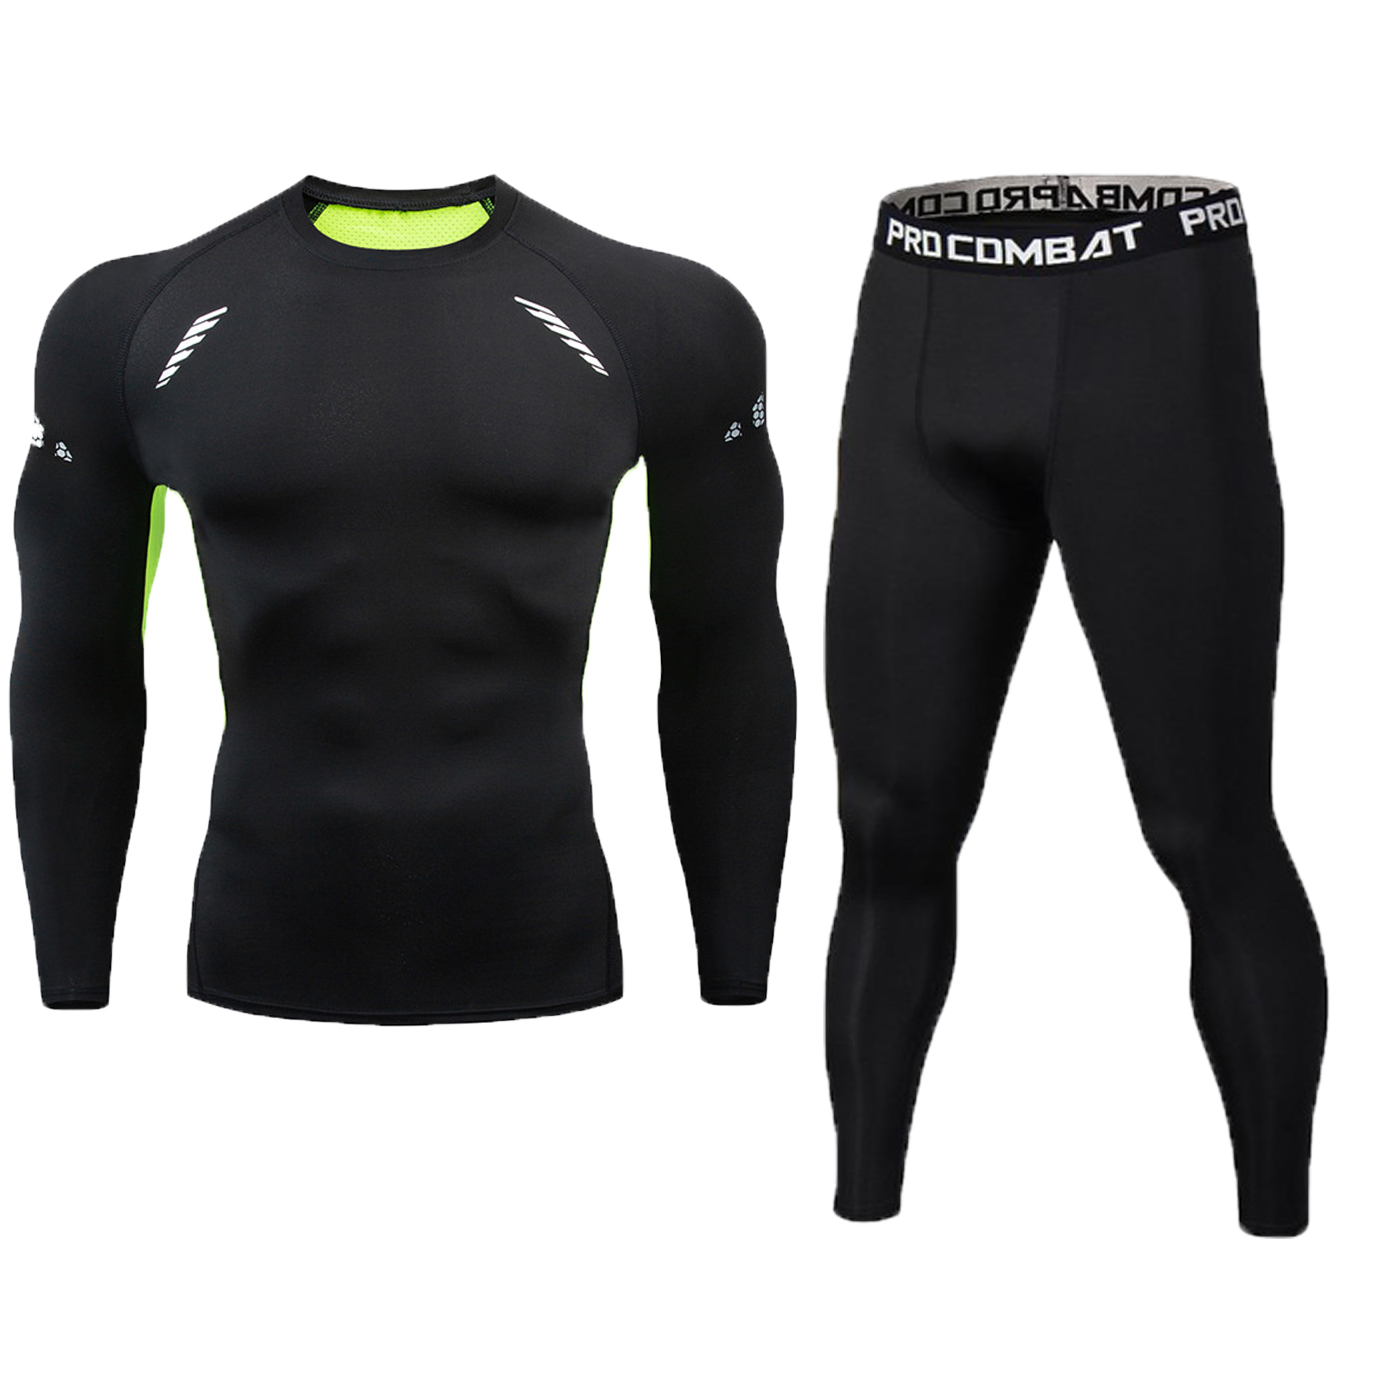 running - Brand 2pcs / sets men suit rashguard male kit MMA compression clothing male long-sleeved t-shirt + leggings tracksuit men